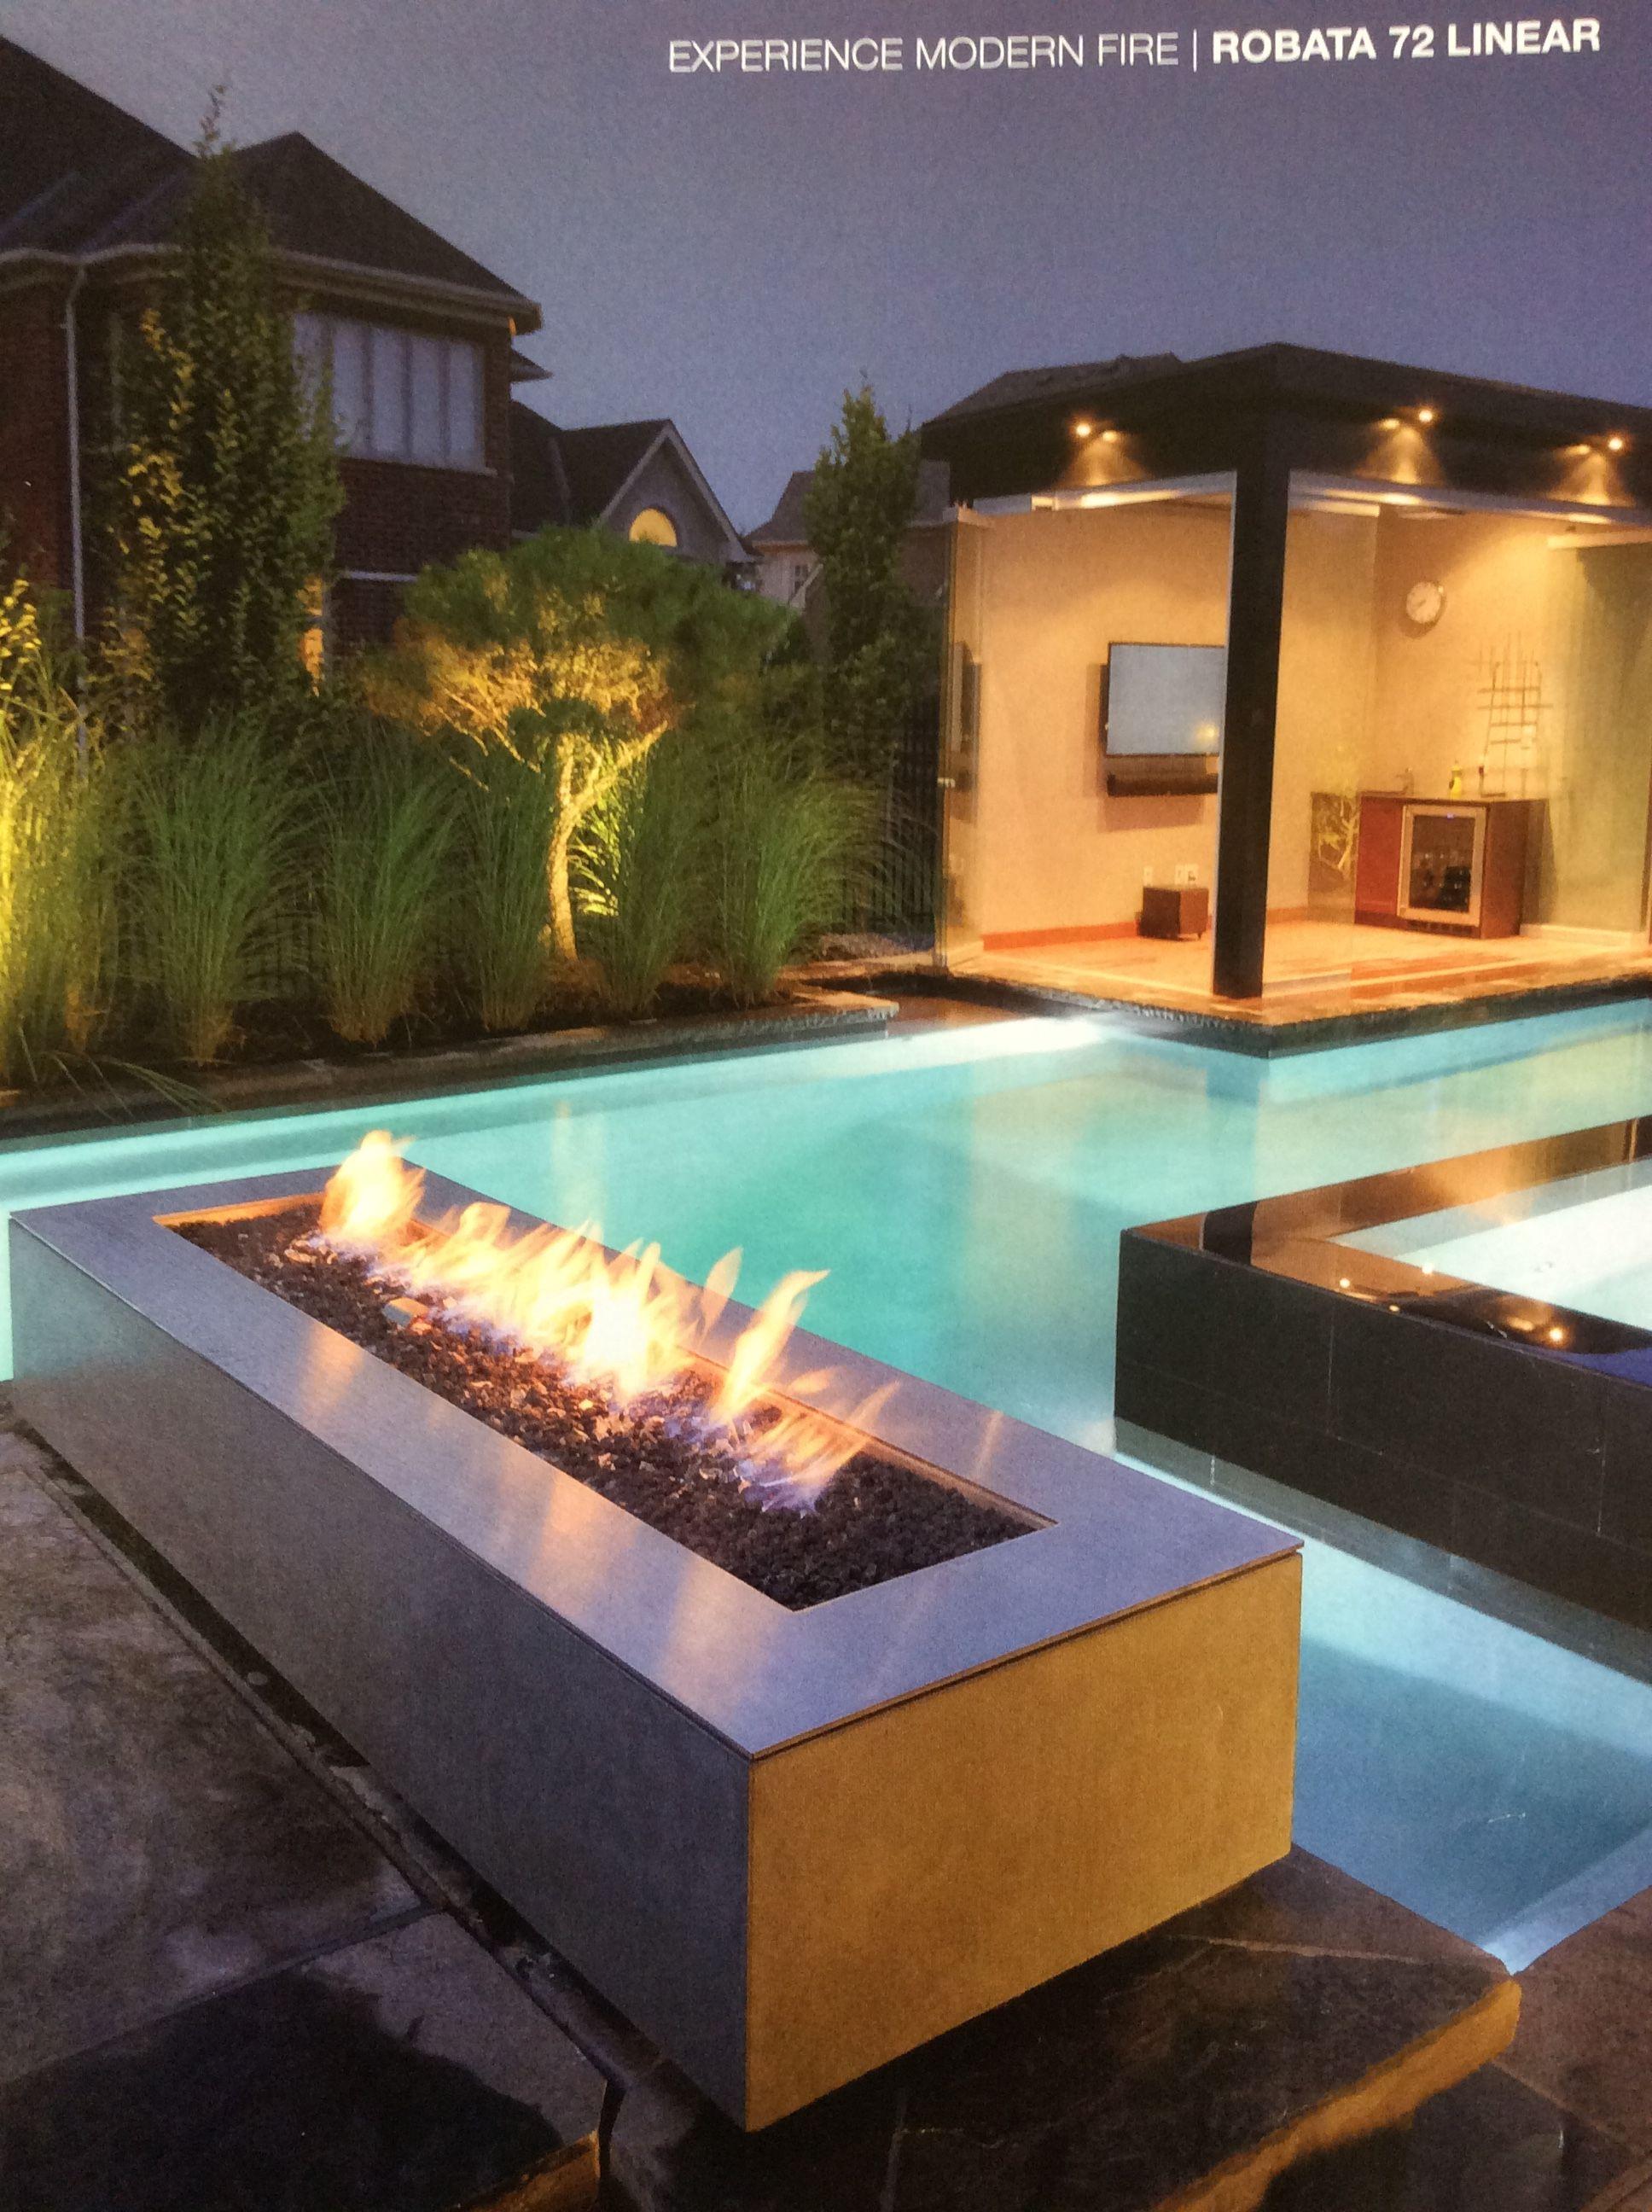 Pin By Tammi Meyer On Decks Modern Fire Pit Fire Pit Decor